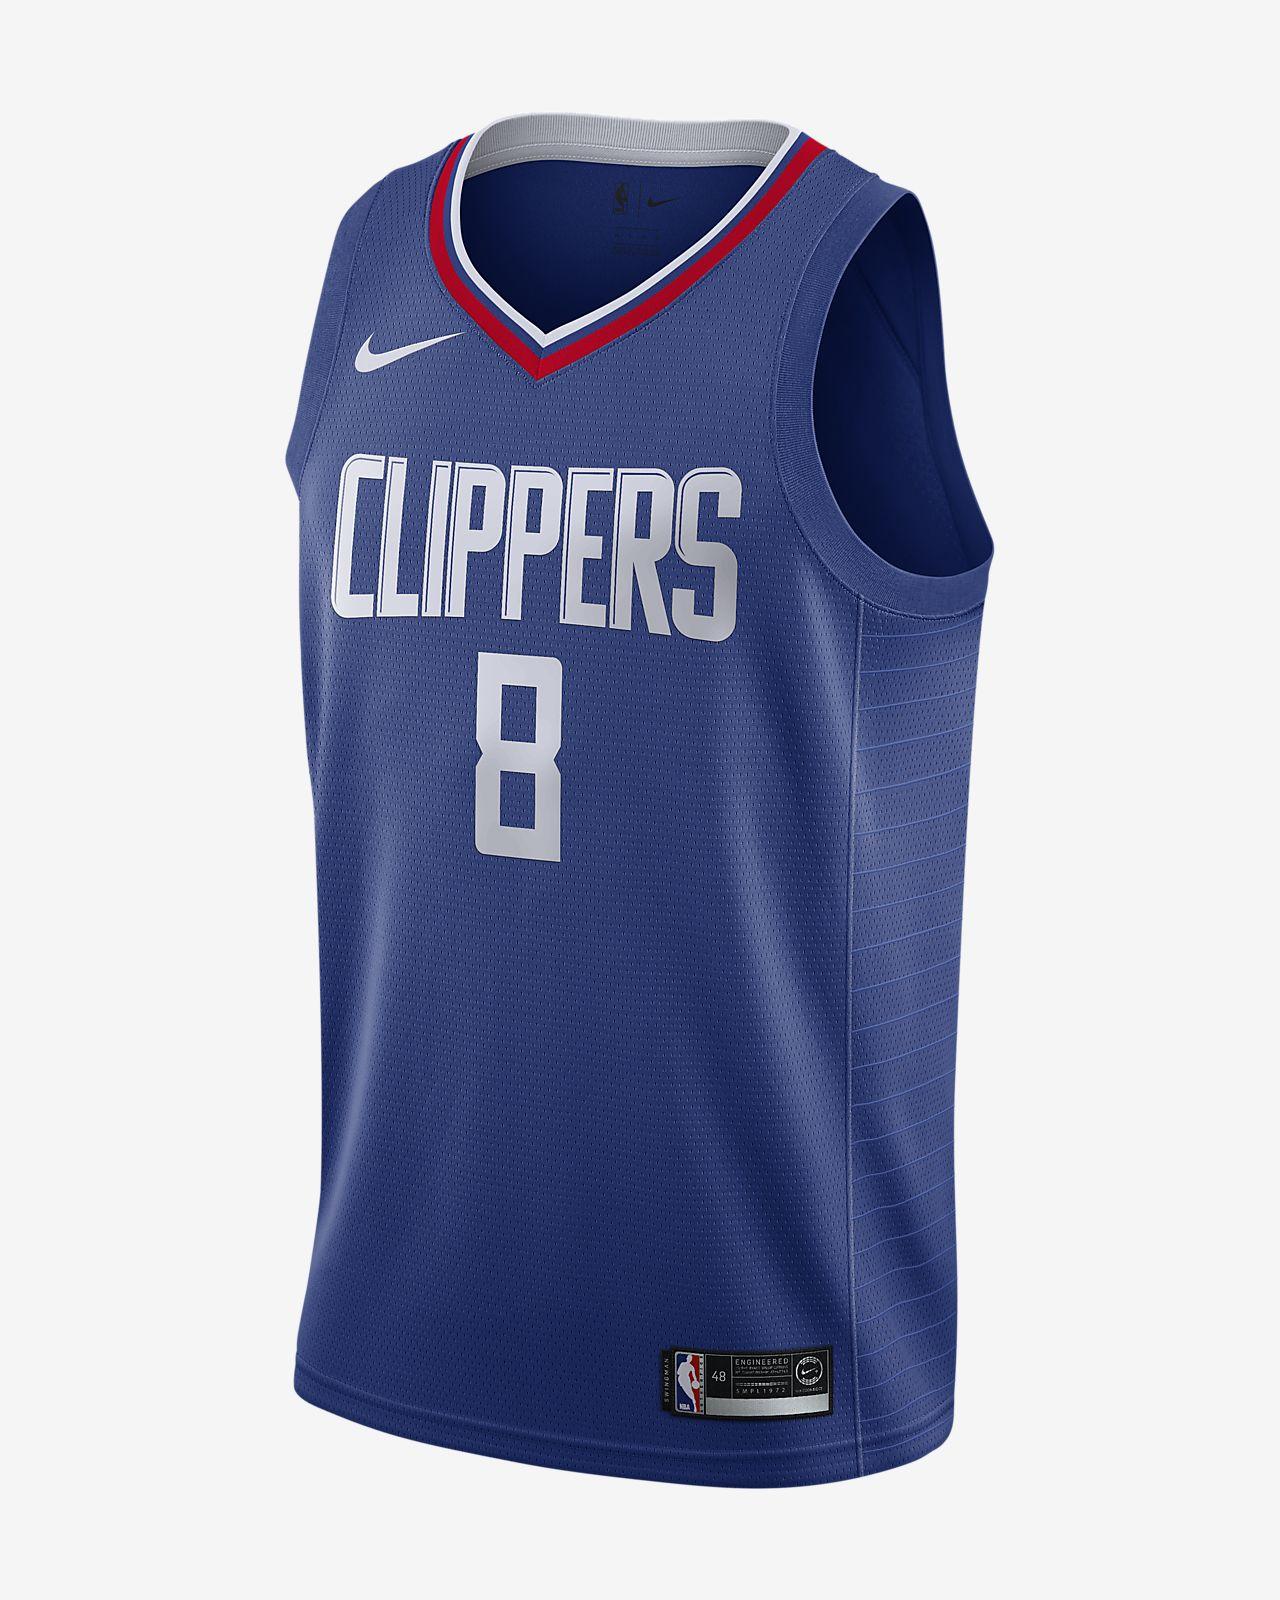 Danilo Gallinari Clippers Icon Edition Nike NBA Swingman Jersey